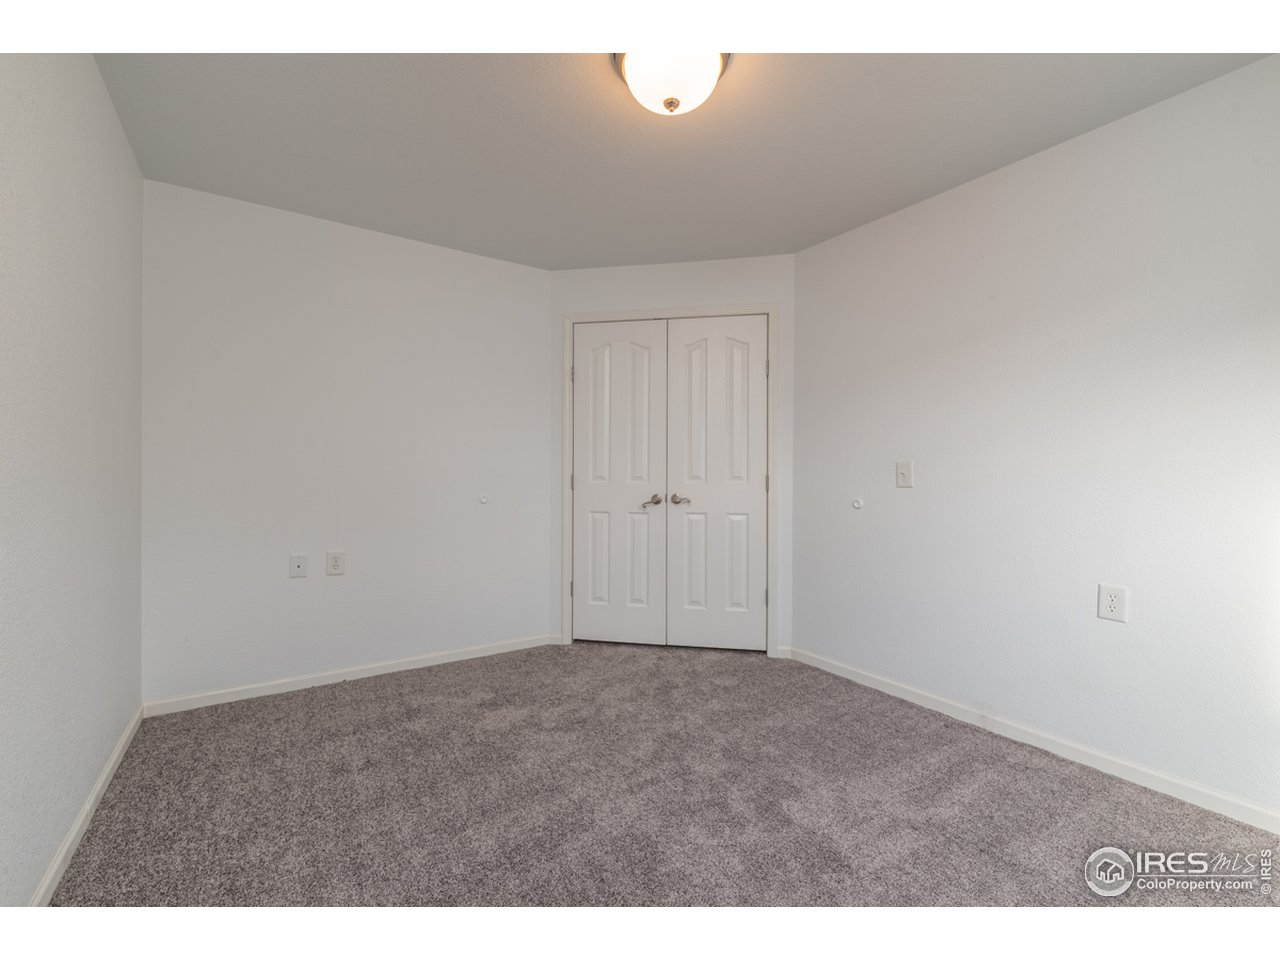 NON CONFORMING 3rd Bedroom/office/den